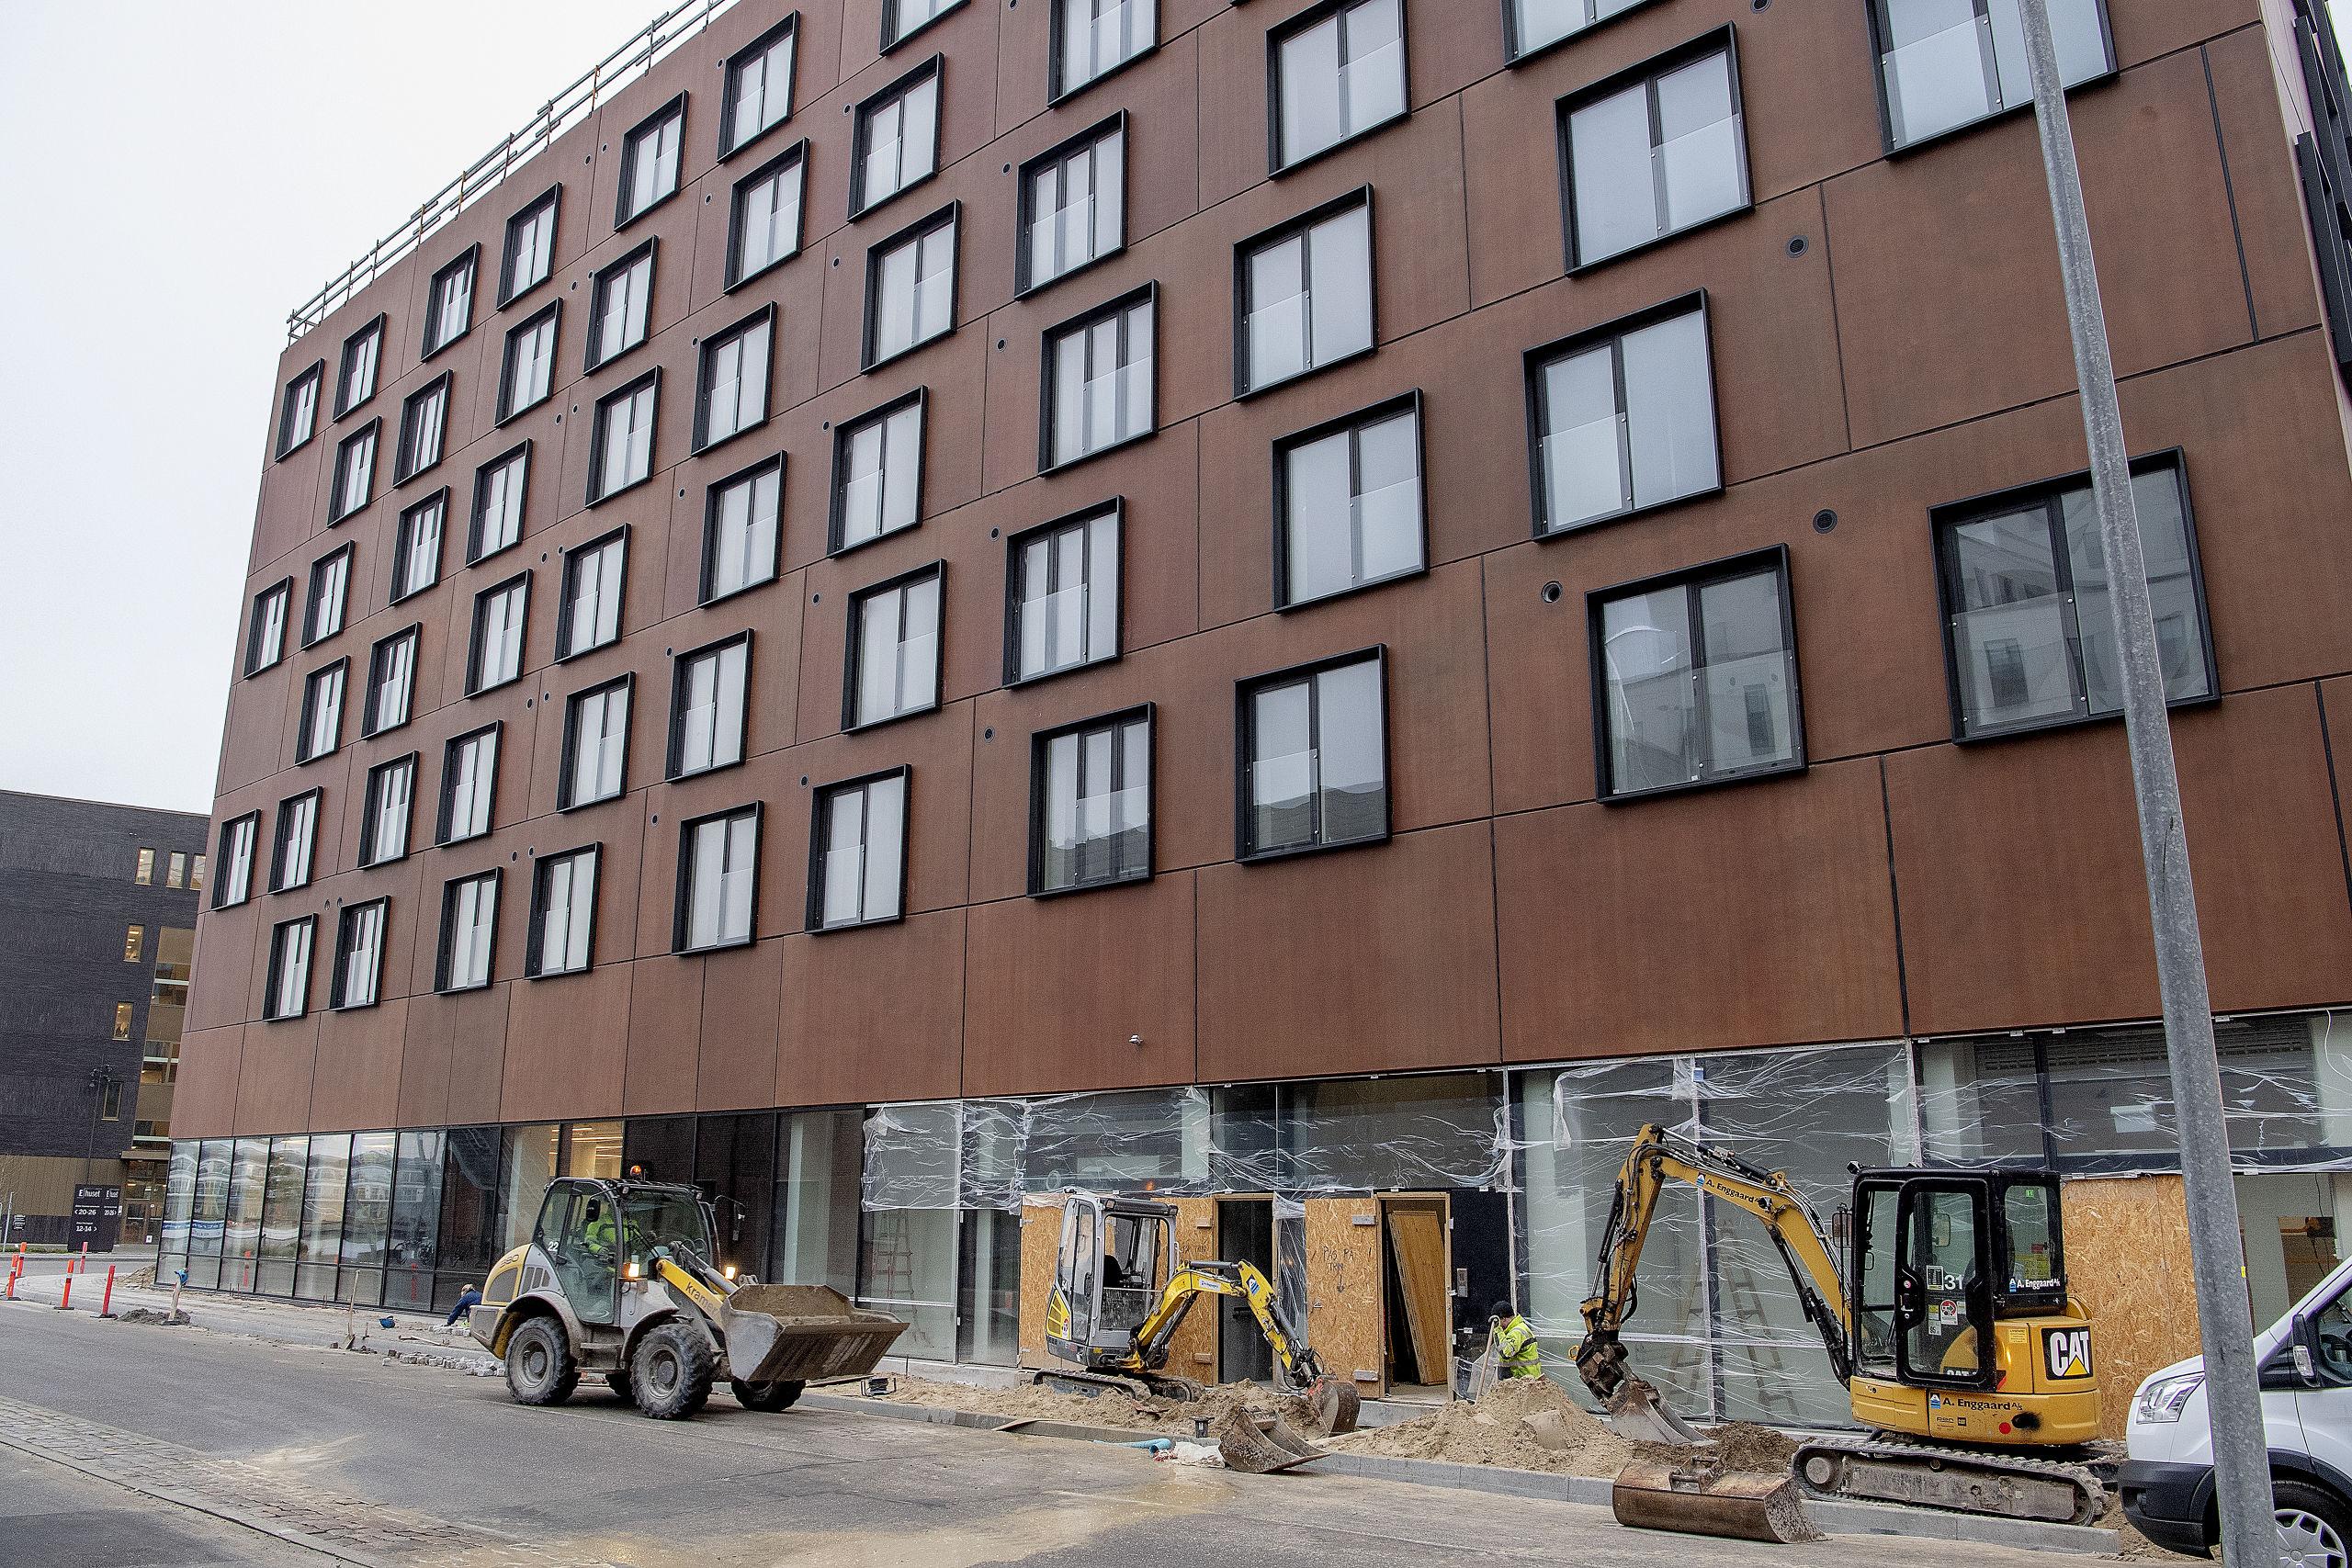 Ny Meny og Lagkagehuset er klar til åbning lige om lidt